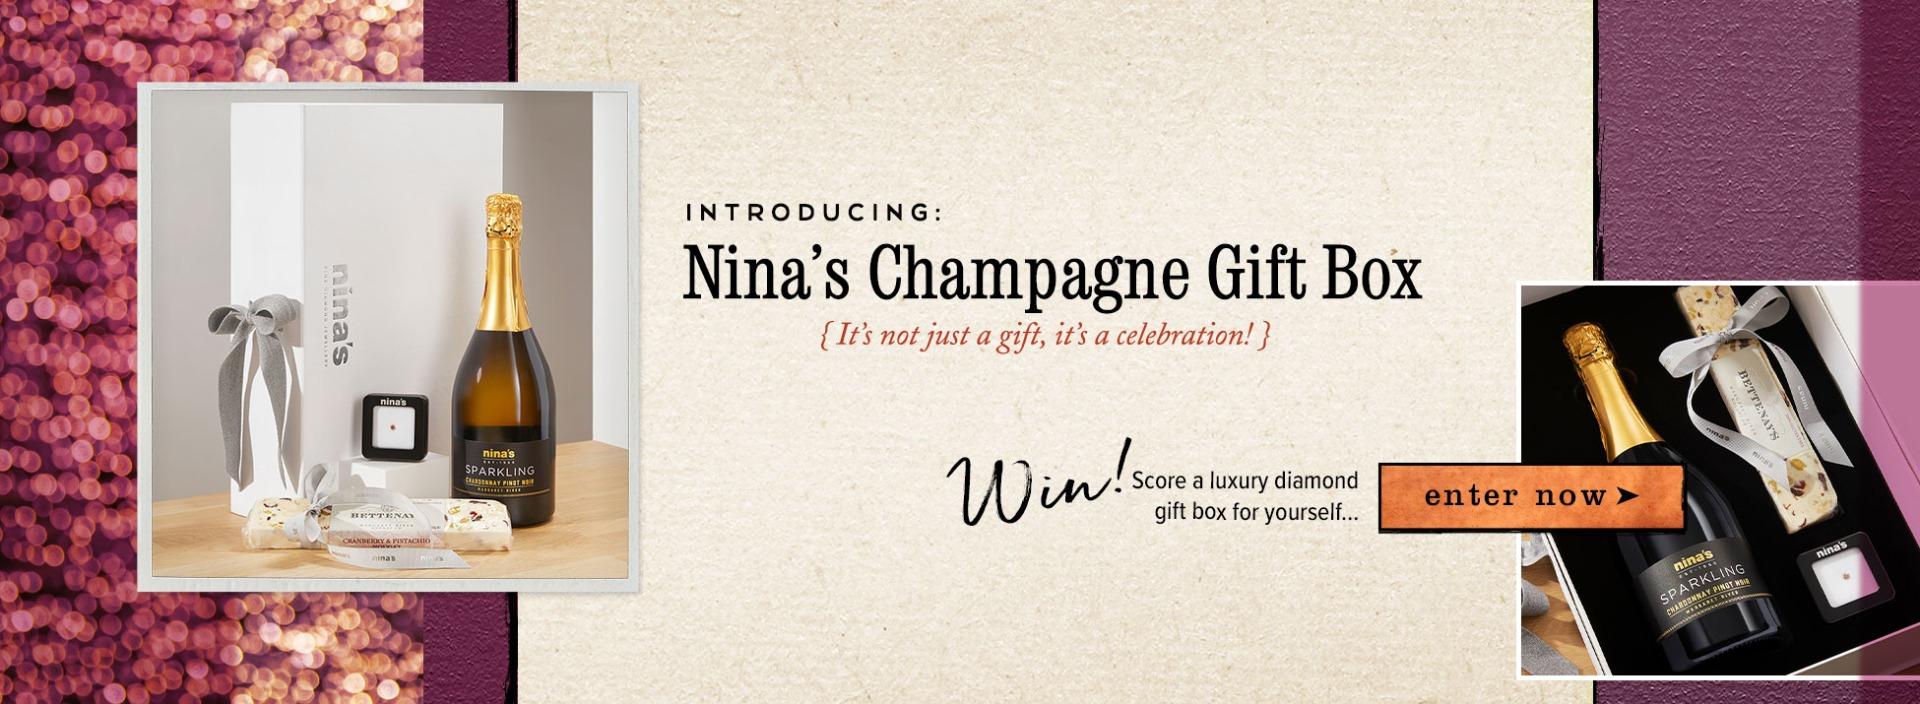 Win a Nina's Champagne Gift Box